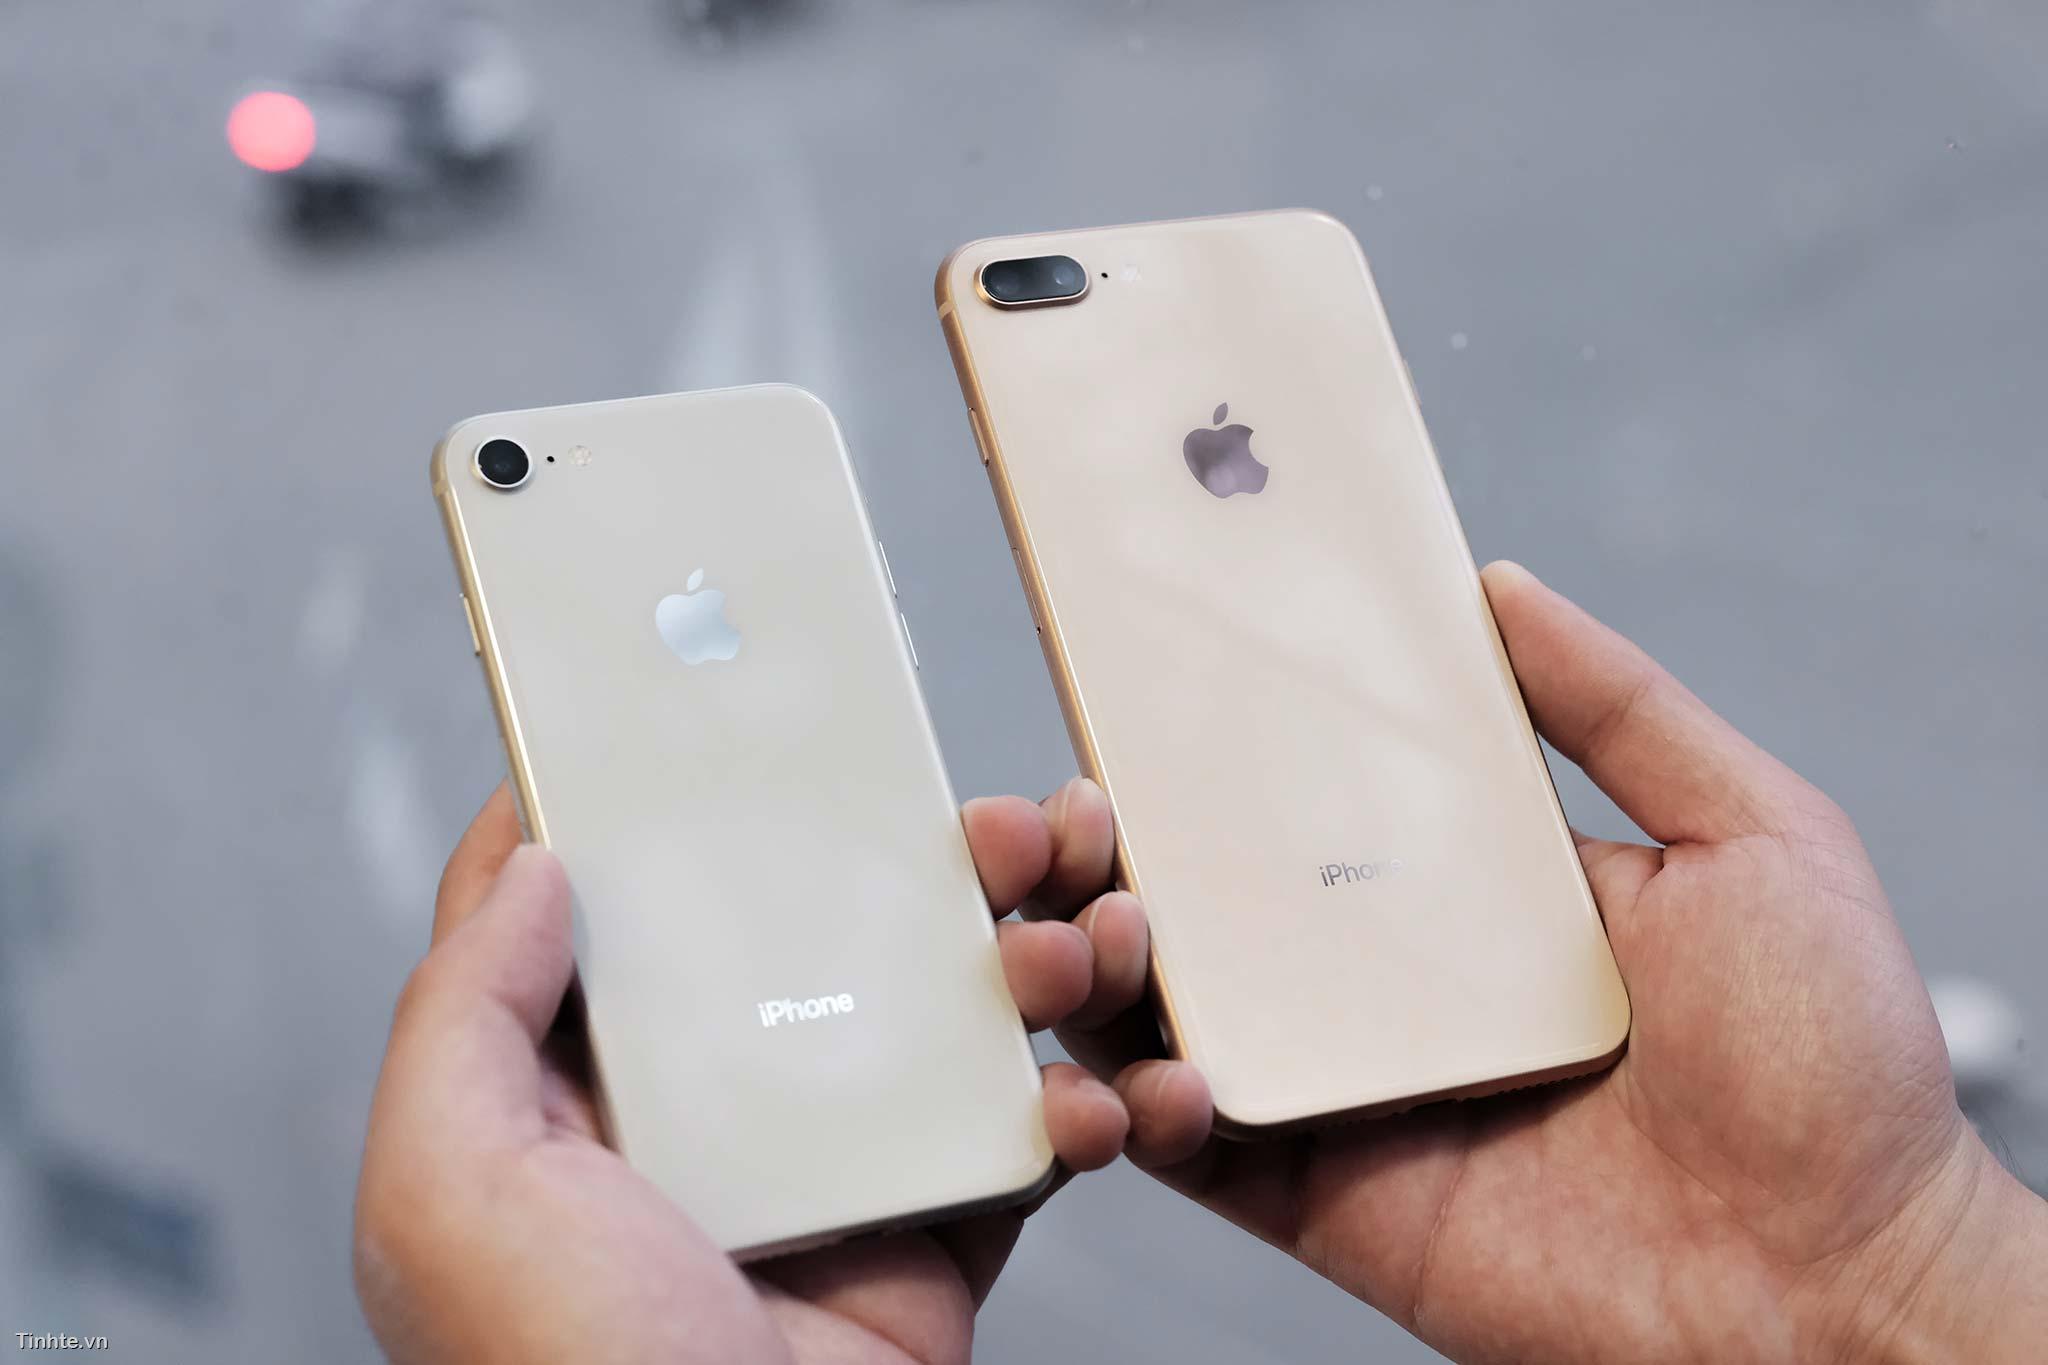 tinhte_tren_tay_apple_iphone_8_iphone8_plus15.jpg